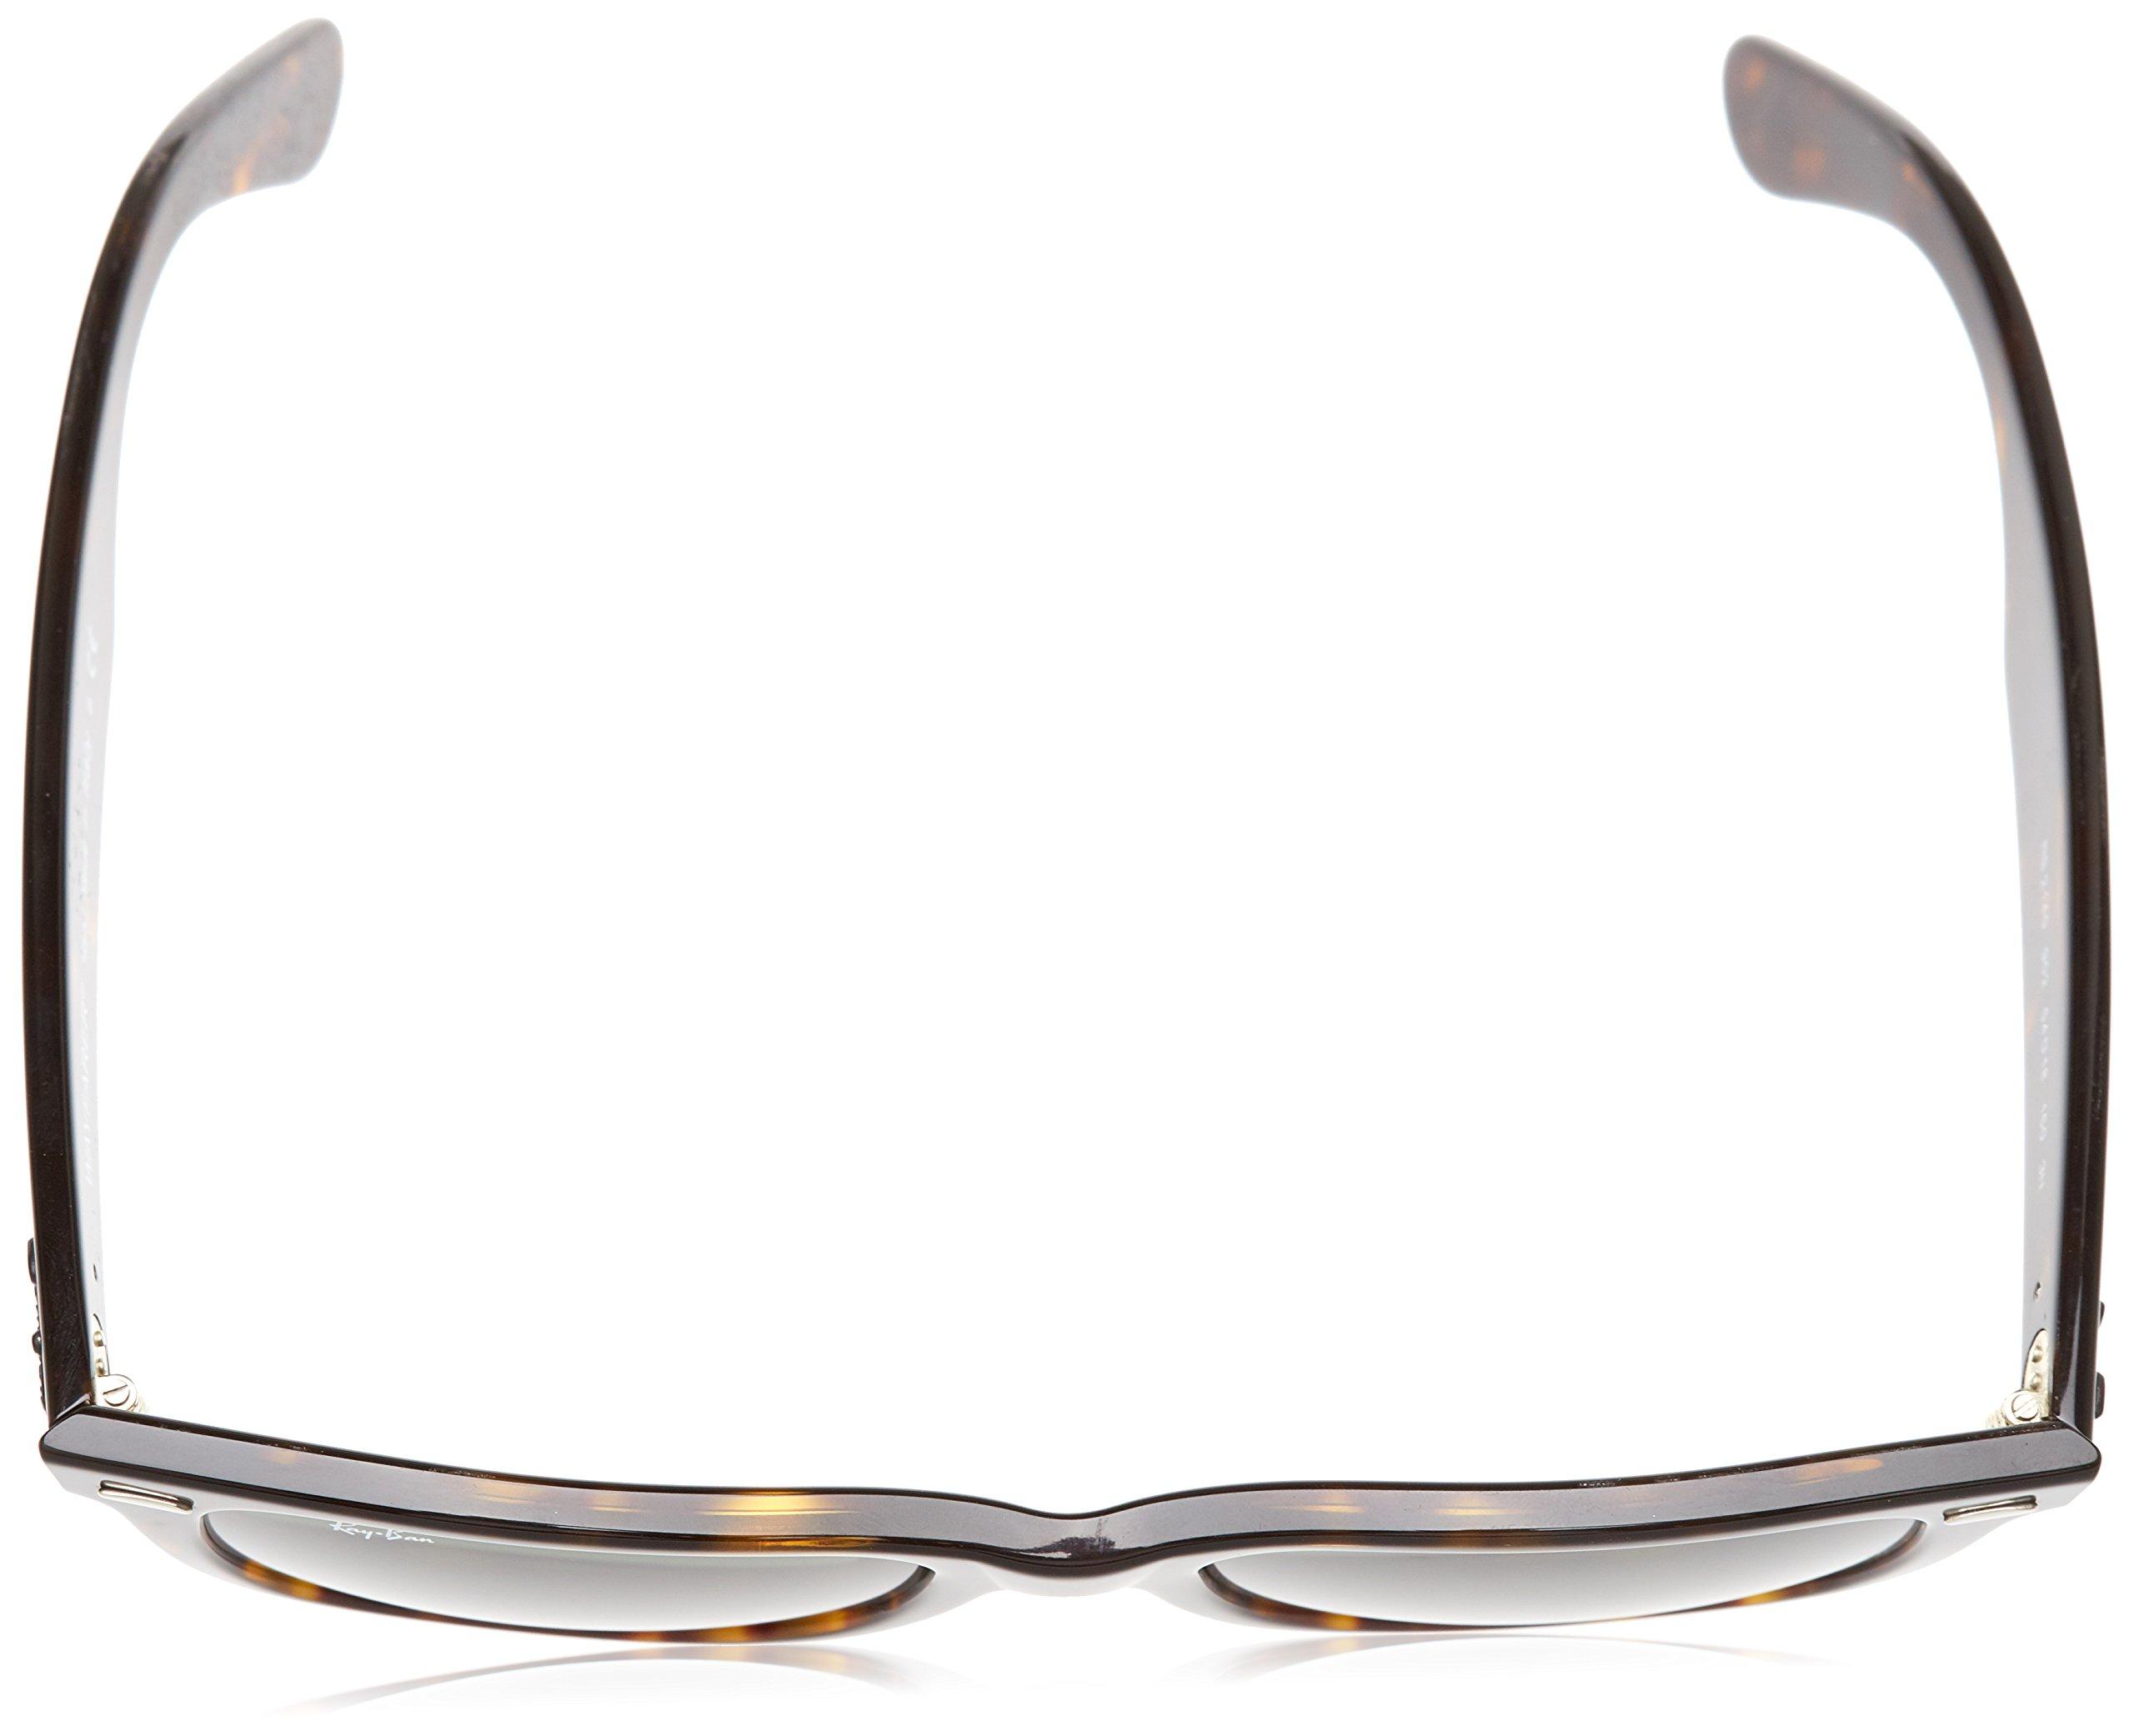 Ray-Ban, RB2140 Original Wayfarer Sunglasses, Unisex Ray-Ban Glasses, 100% UV Protection, Non-Polarized, Reduce Eye Strain, Lightweight Acetate Frame, Prescription-Ready Lenses, 54 mm Frame by Ray-Ban (Image #4)